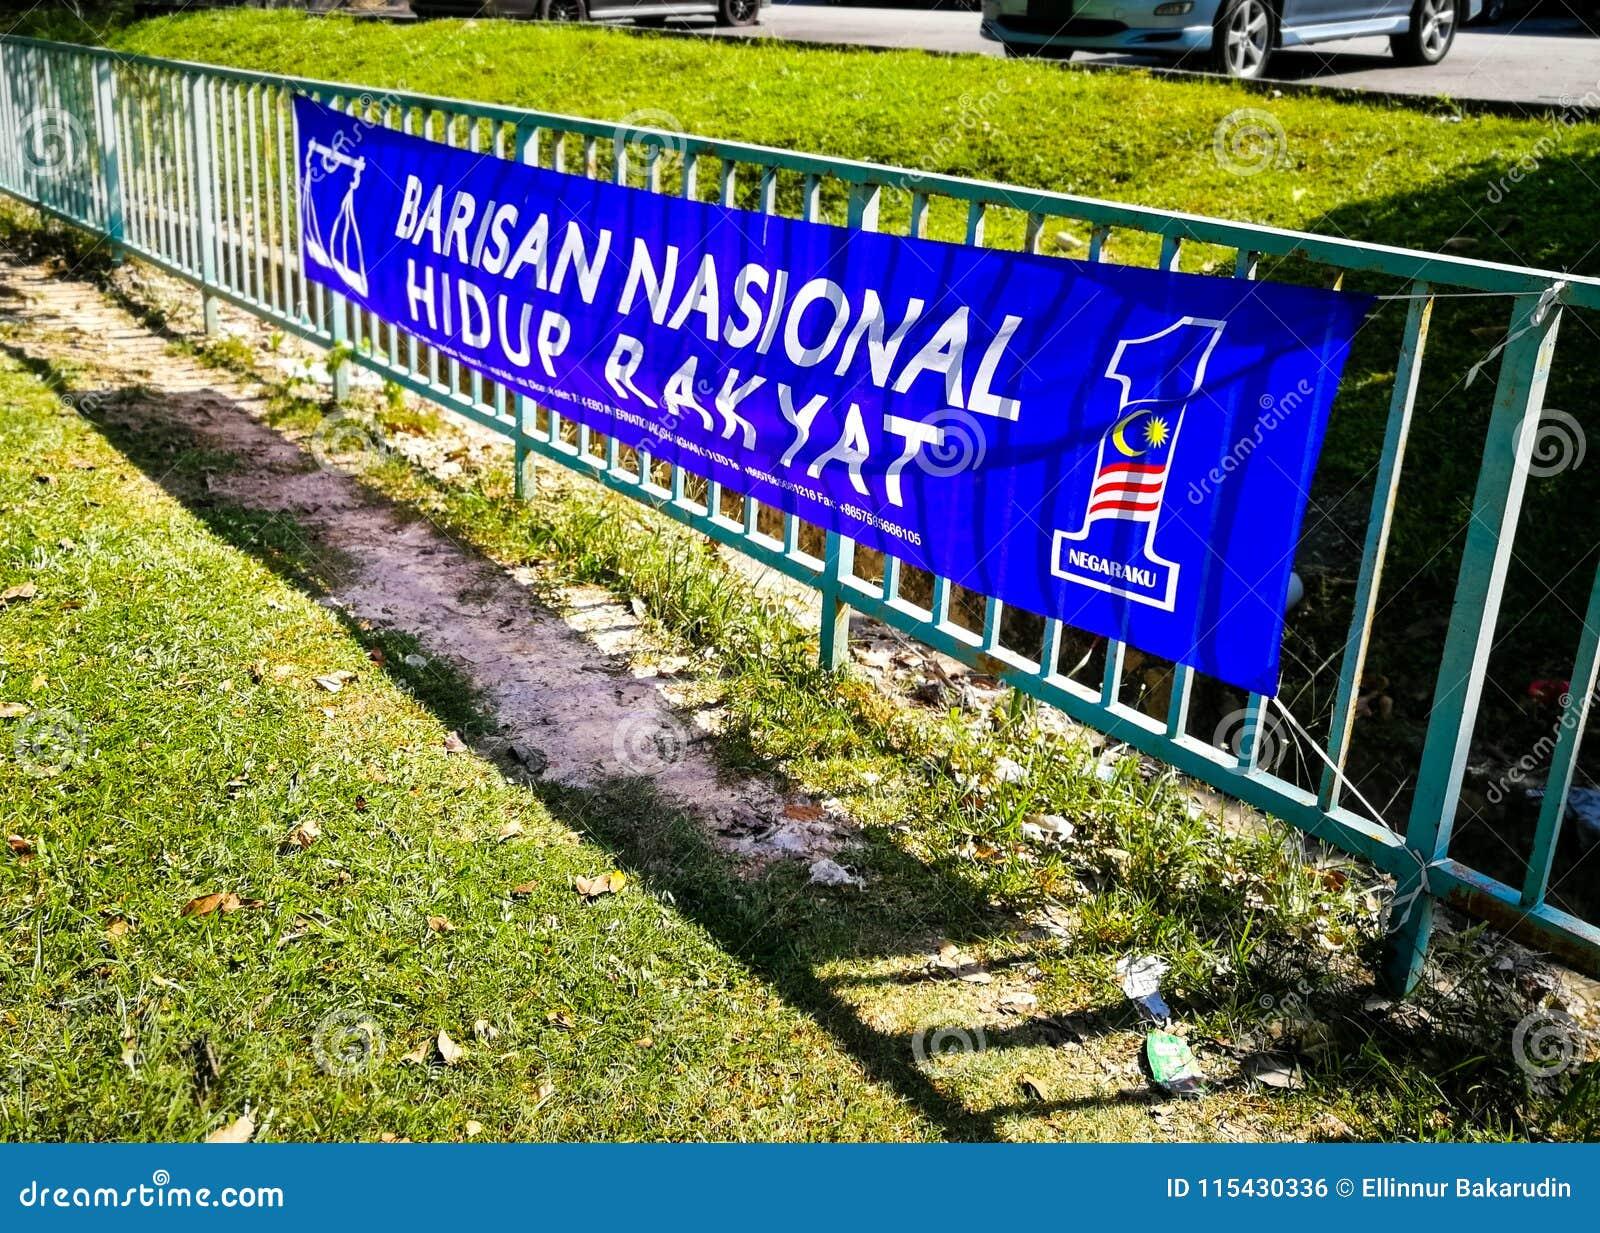 SELANGOR, ΜΑΛΑΙΣΙΑ - 28 Απριλίου 2018: οι σημαίες και τα εμβλήματα των πολιτικών κομμάτων που θα συμμετάσχουν 14ο σε γενικό της Μ